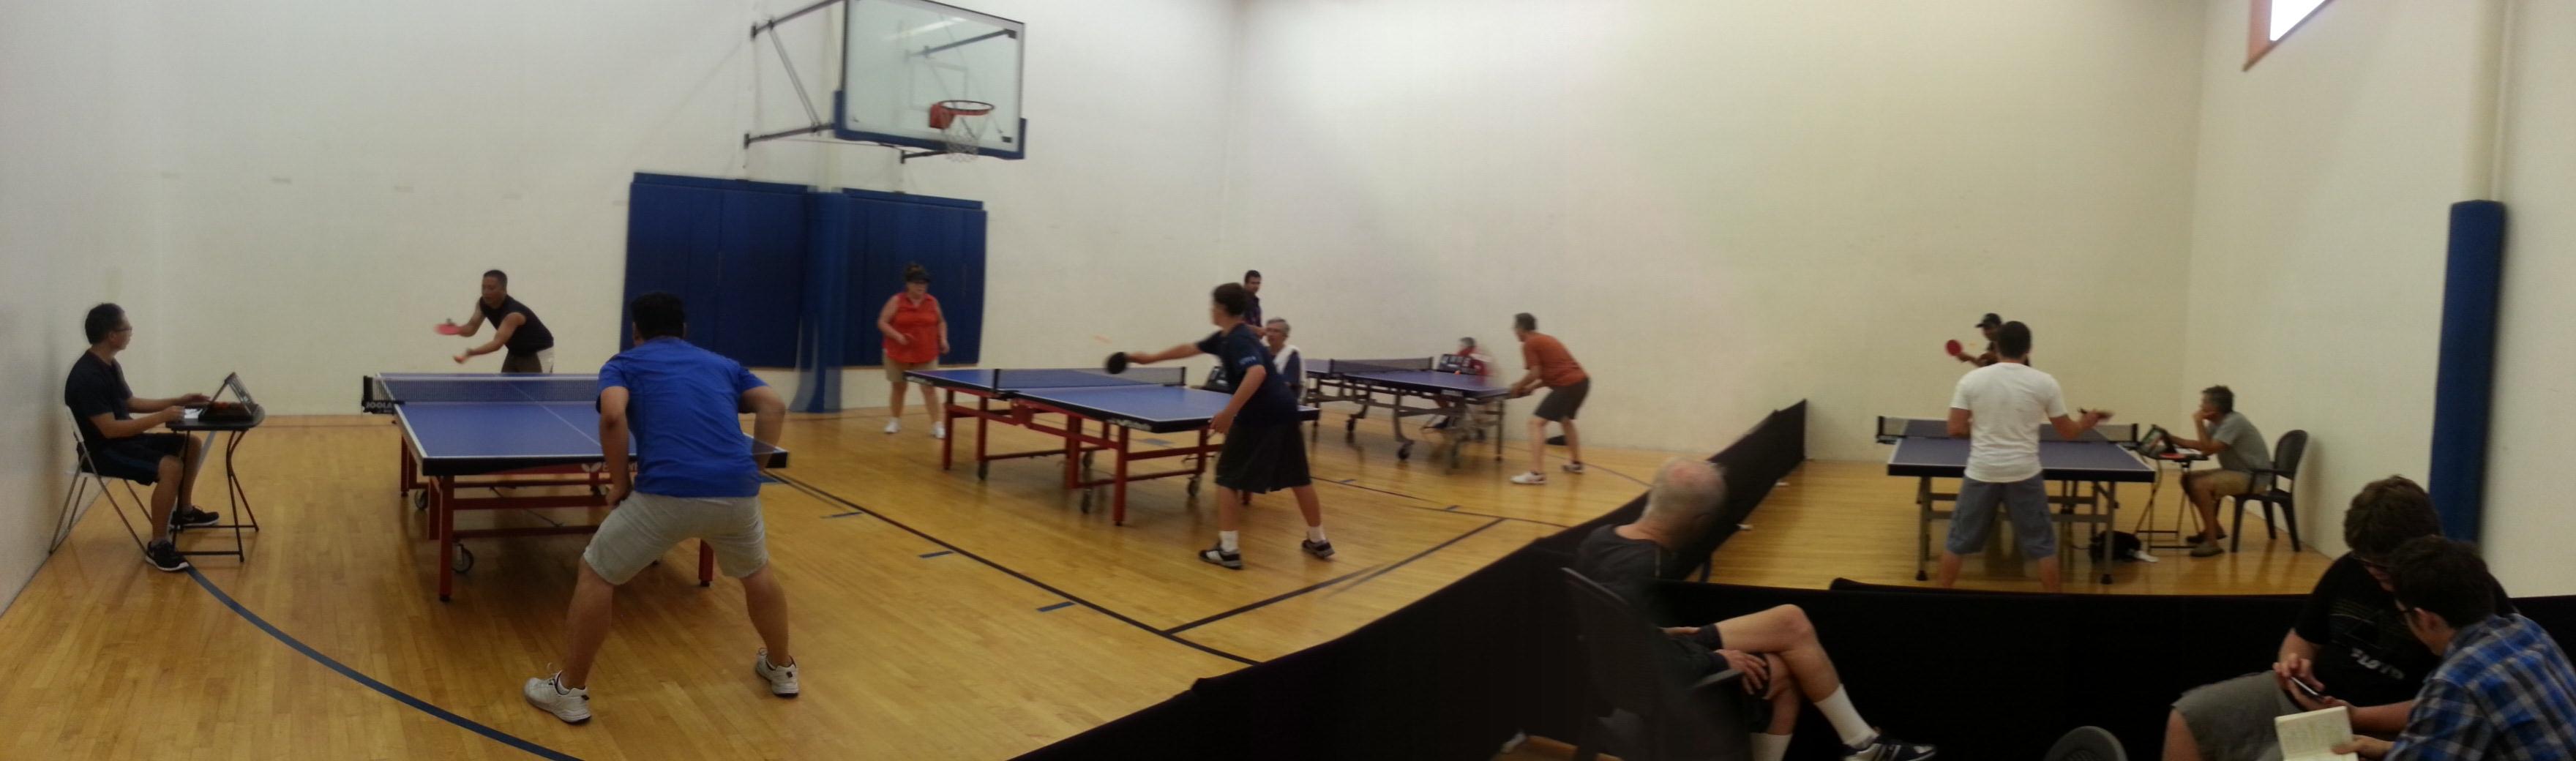 Equal Challenge Tournament in Newport Beach